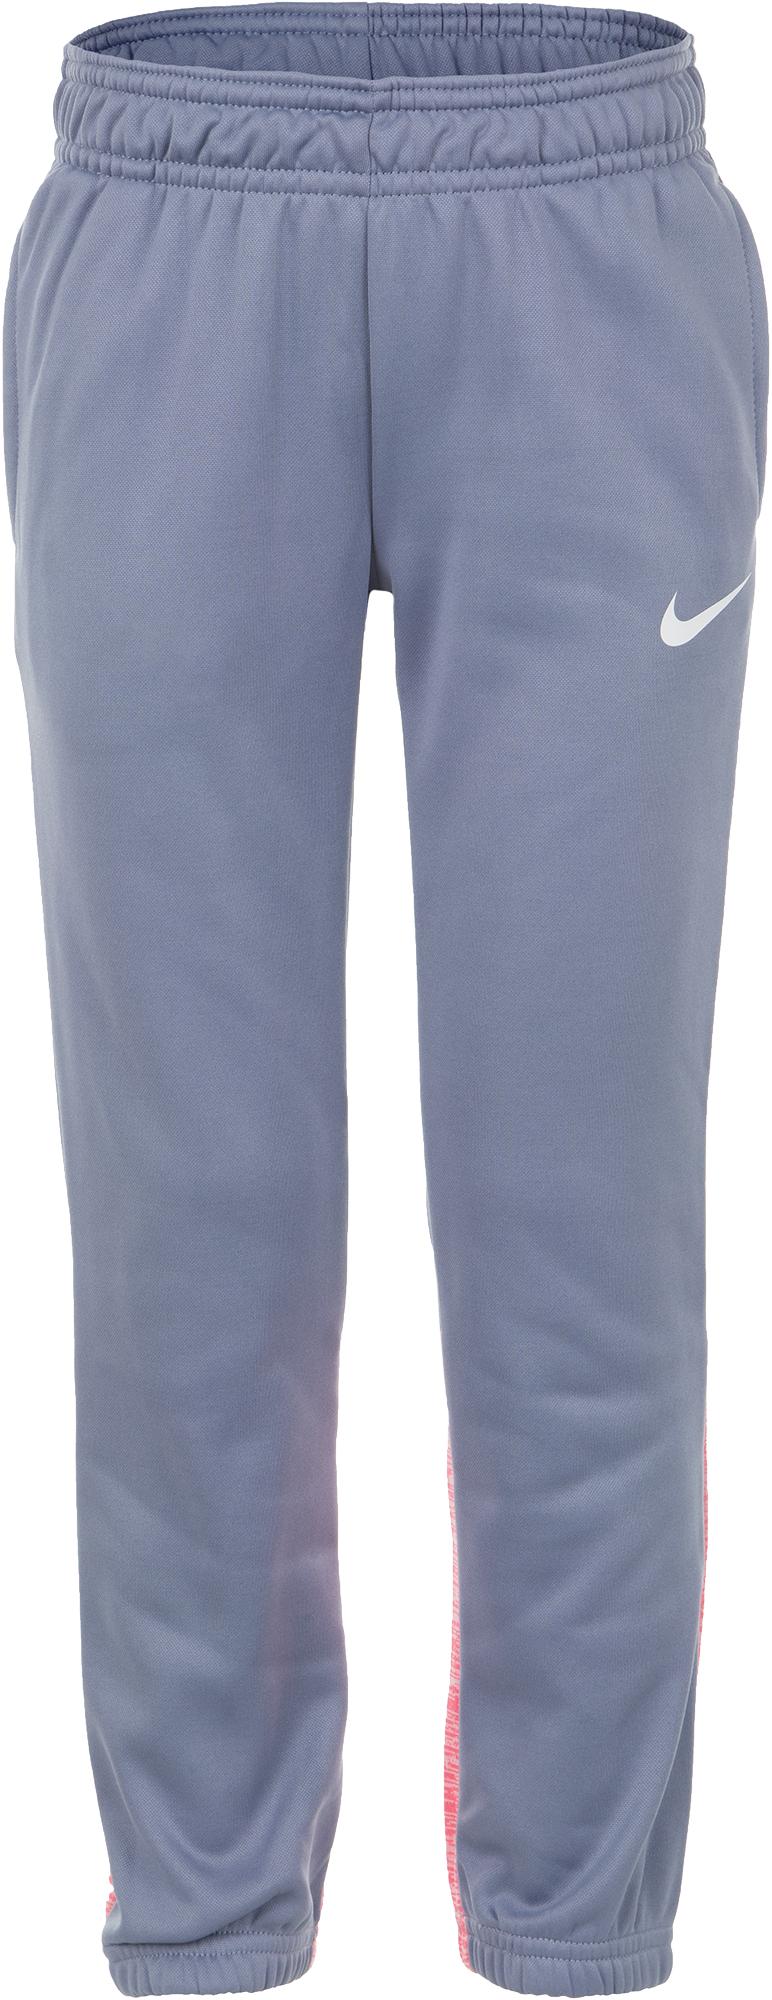 купить Nike Брюки для девочек Nike Therma, размер 122 недорого